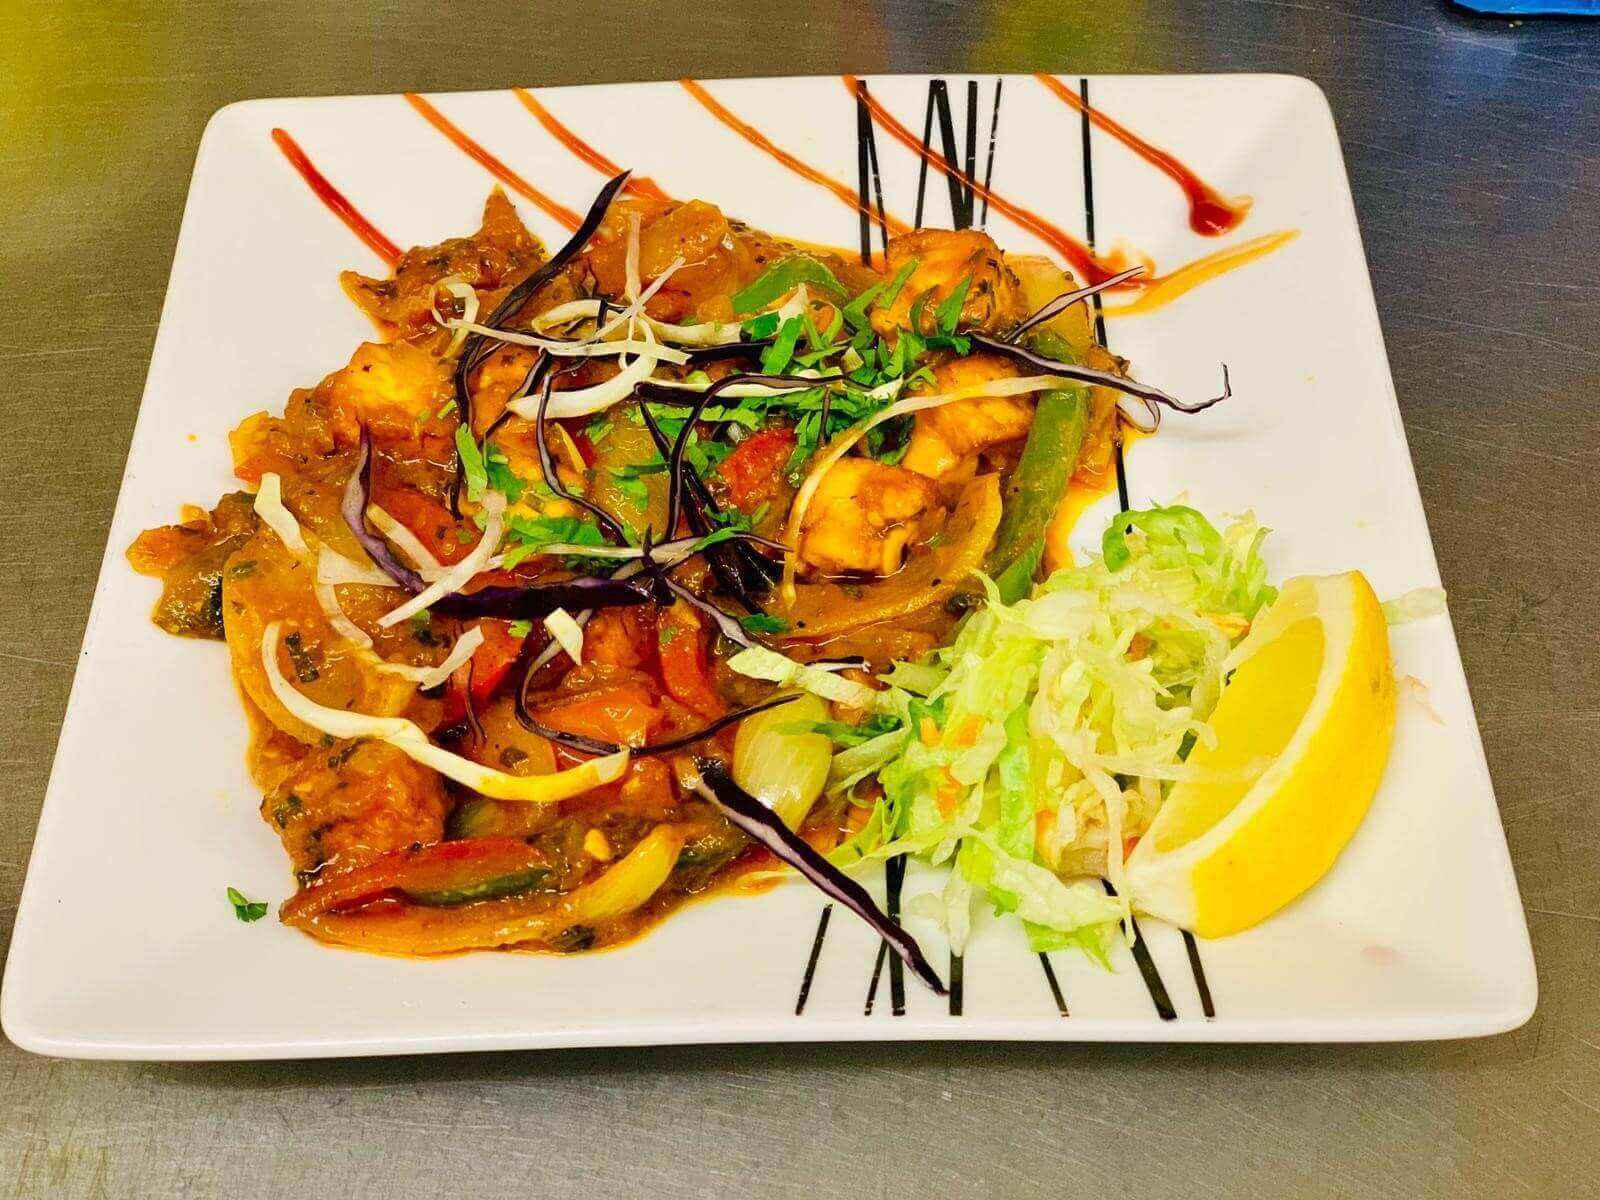 30. Indian food at khans restaurant battersea sw11